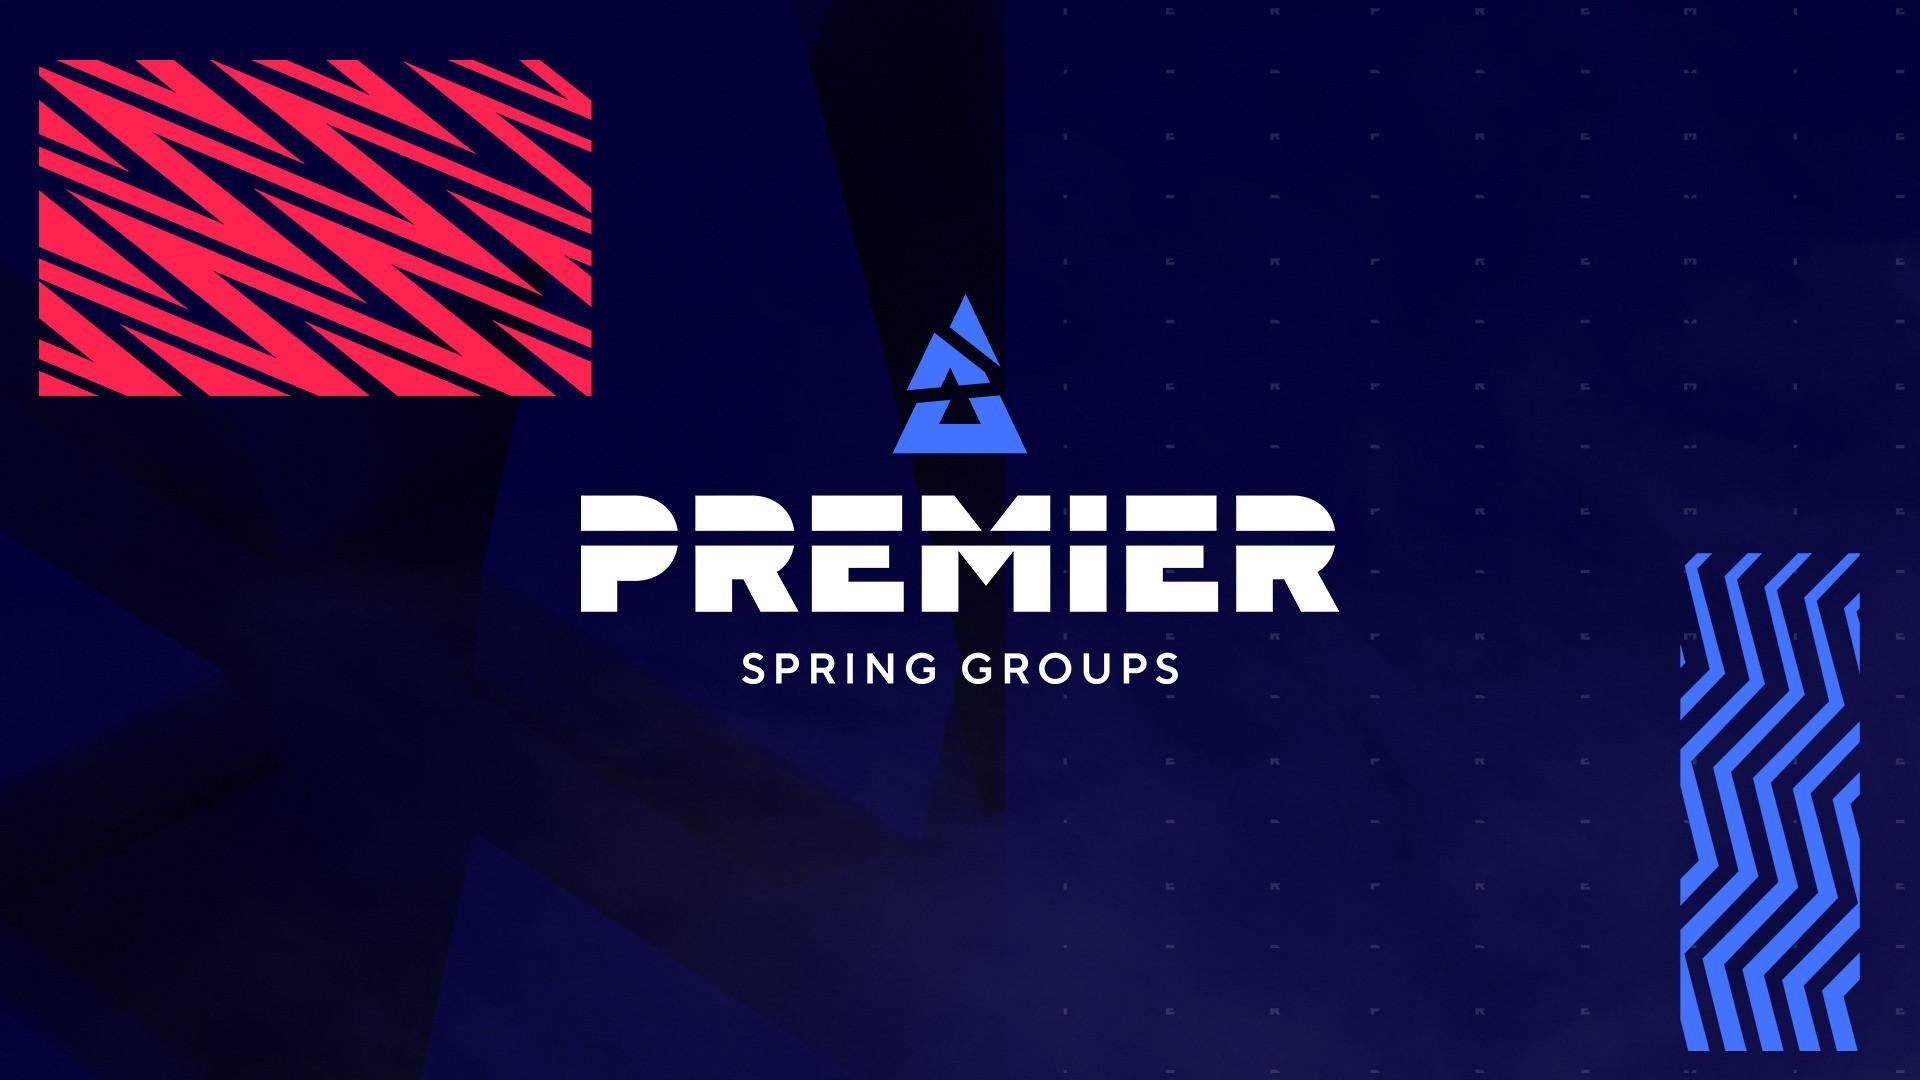 BLAST Premier Spring 2021 : BIG et NiP qualifiés !